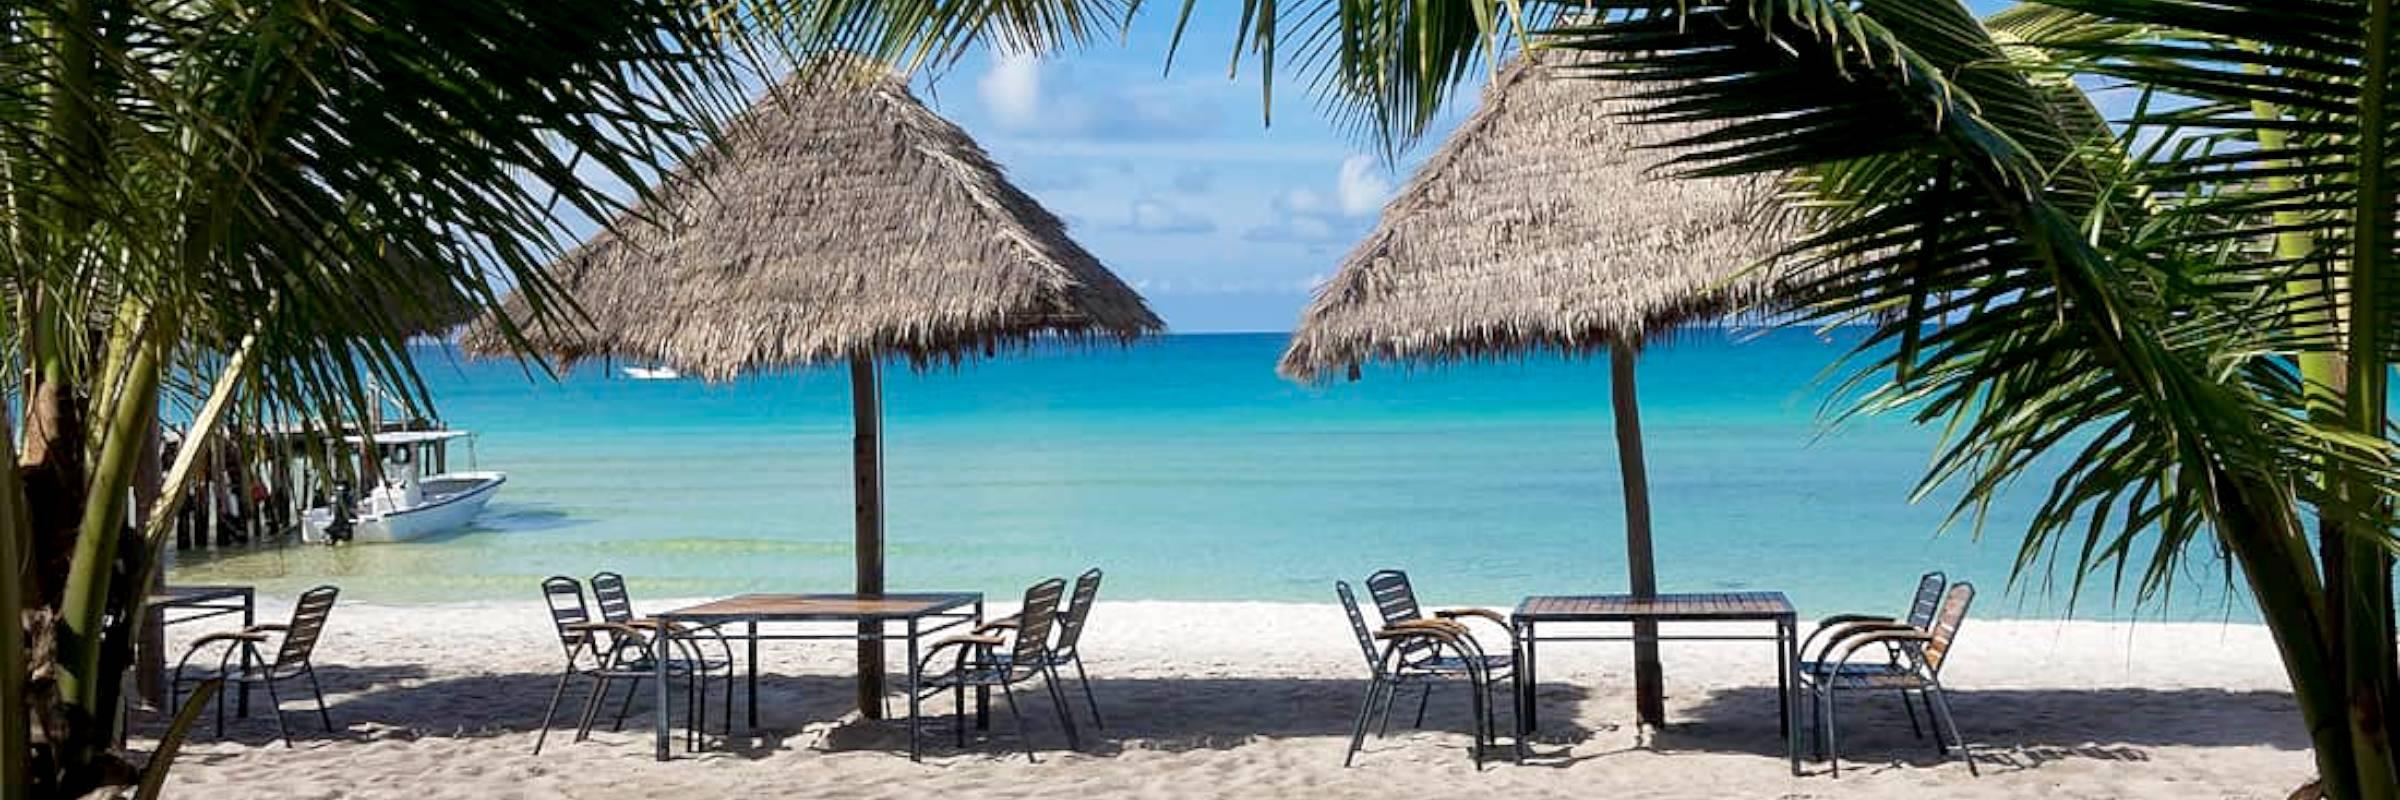 strand-sok-san-beach-resort-koh-rong-kambodscha